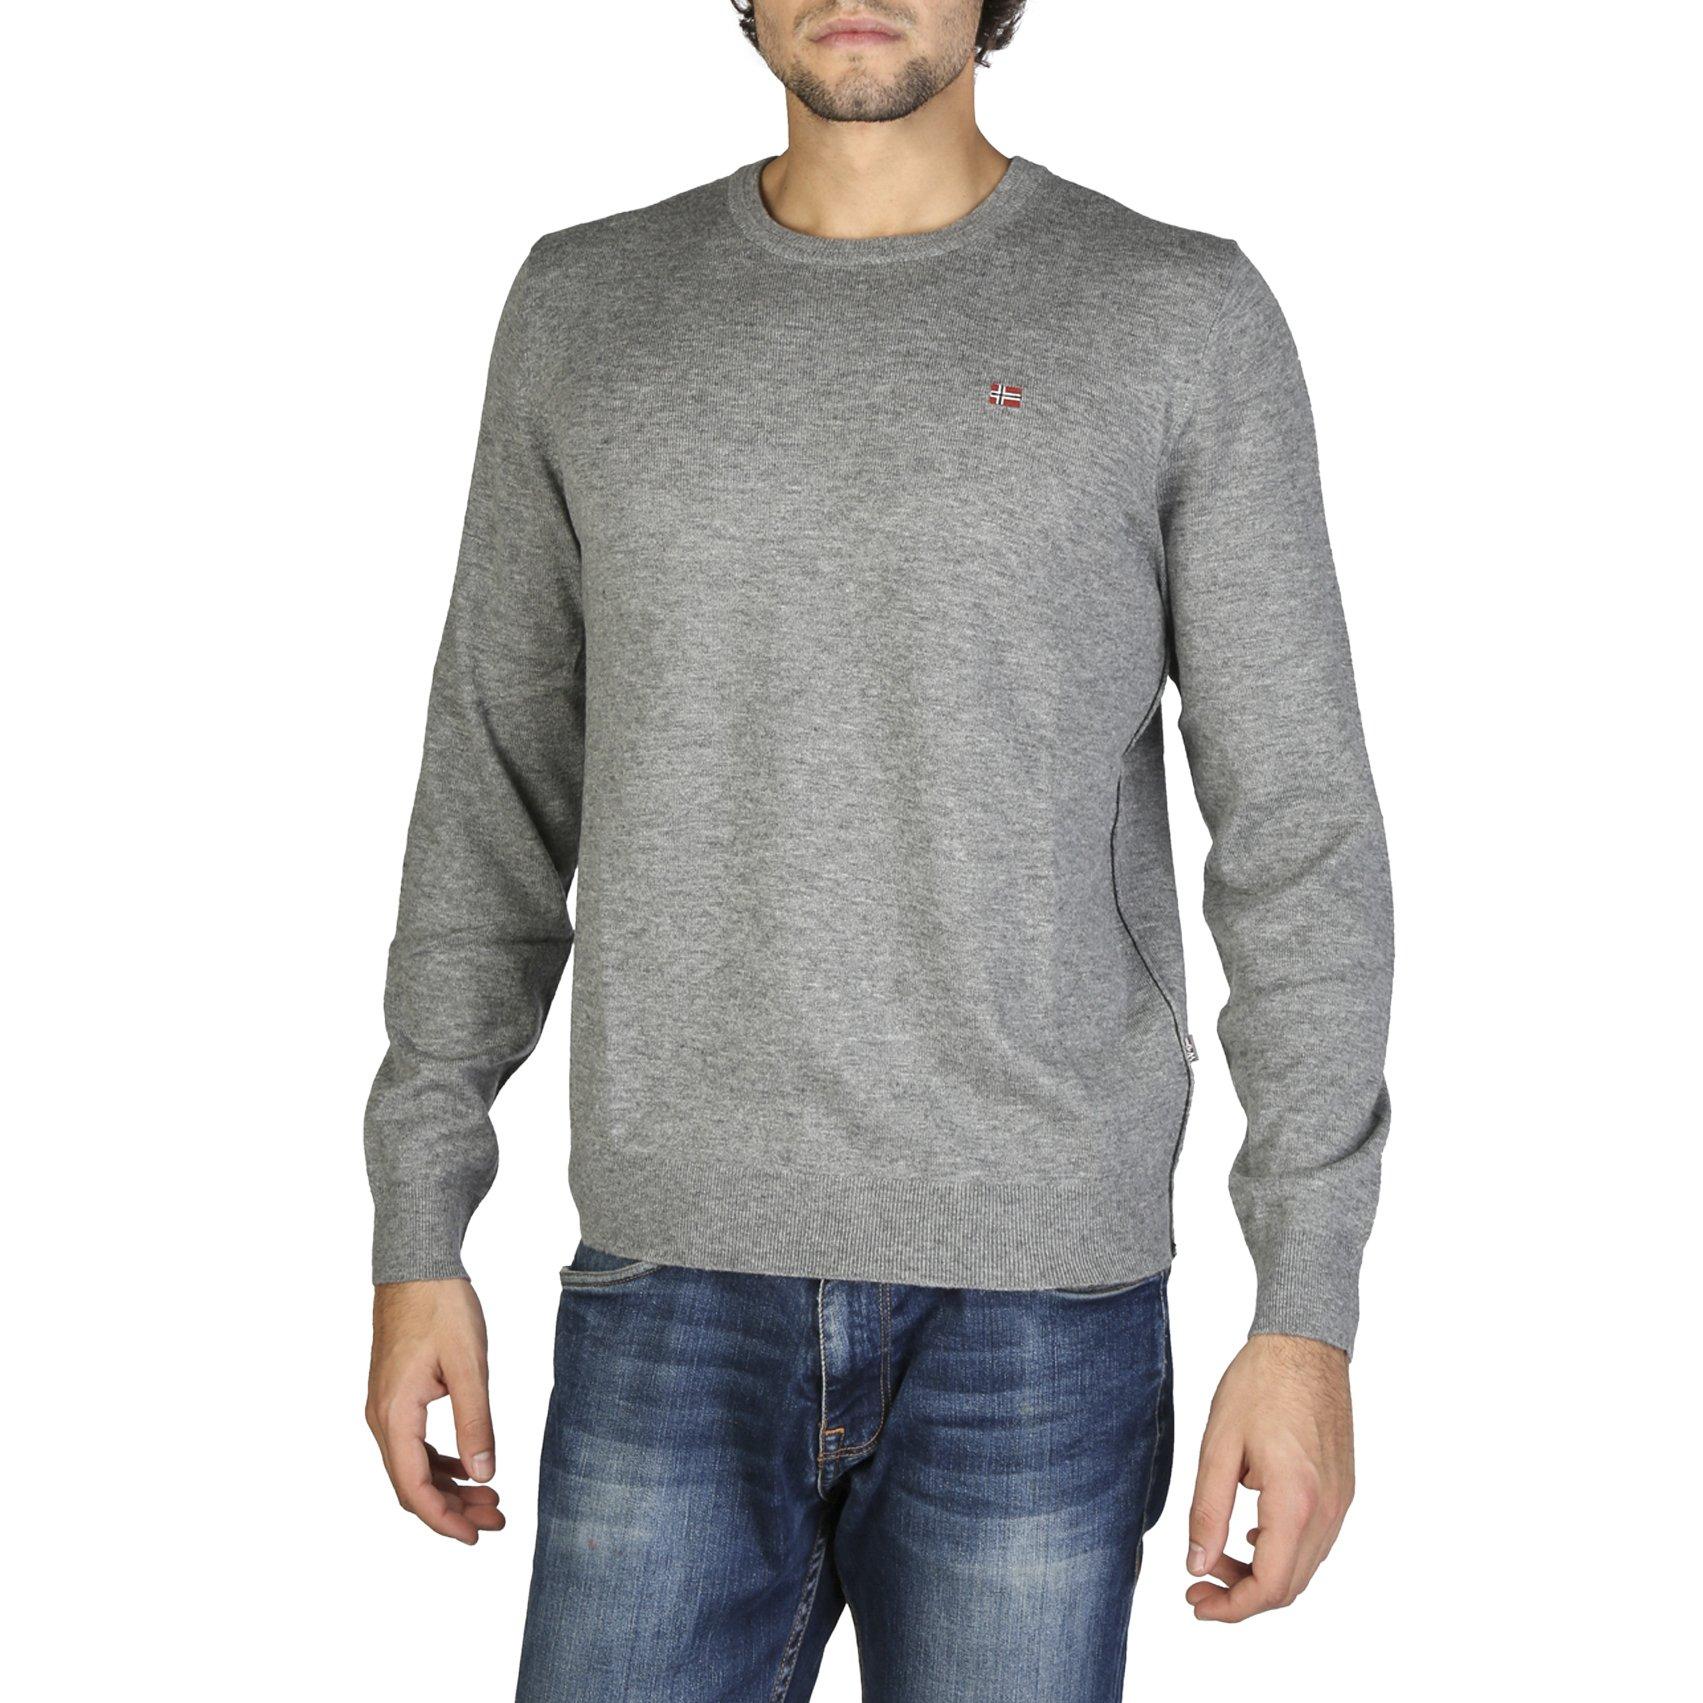 Napapijri Men's Sweater Various Colours DAMAVAND_N0YGPB - grey S